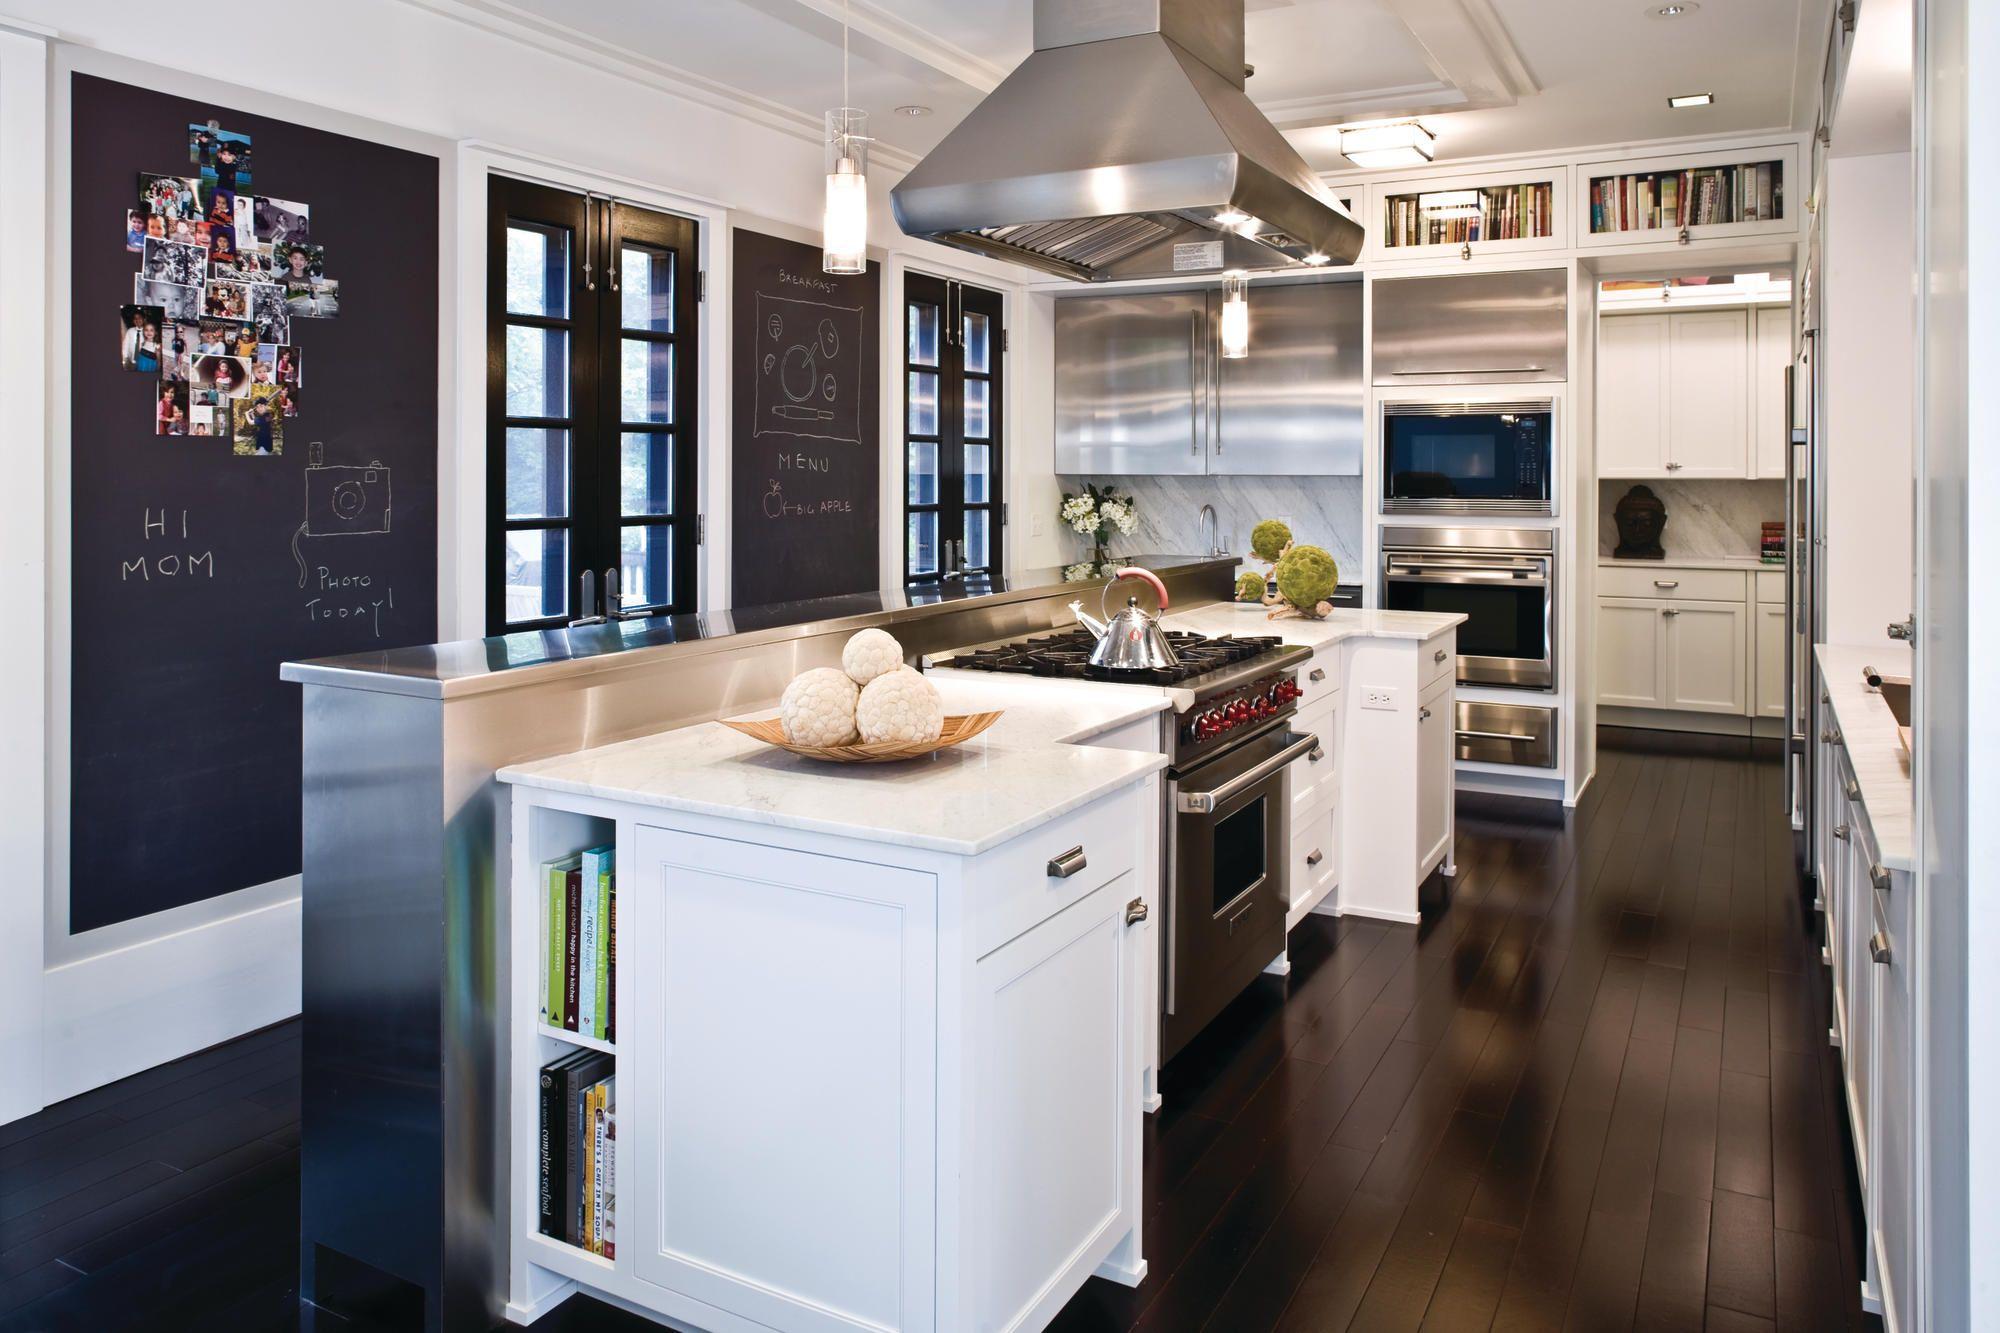 black and white kitchen decor kitchen decor theme ideas